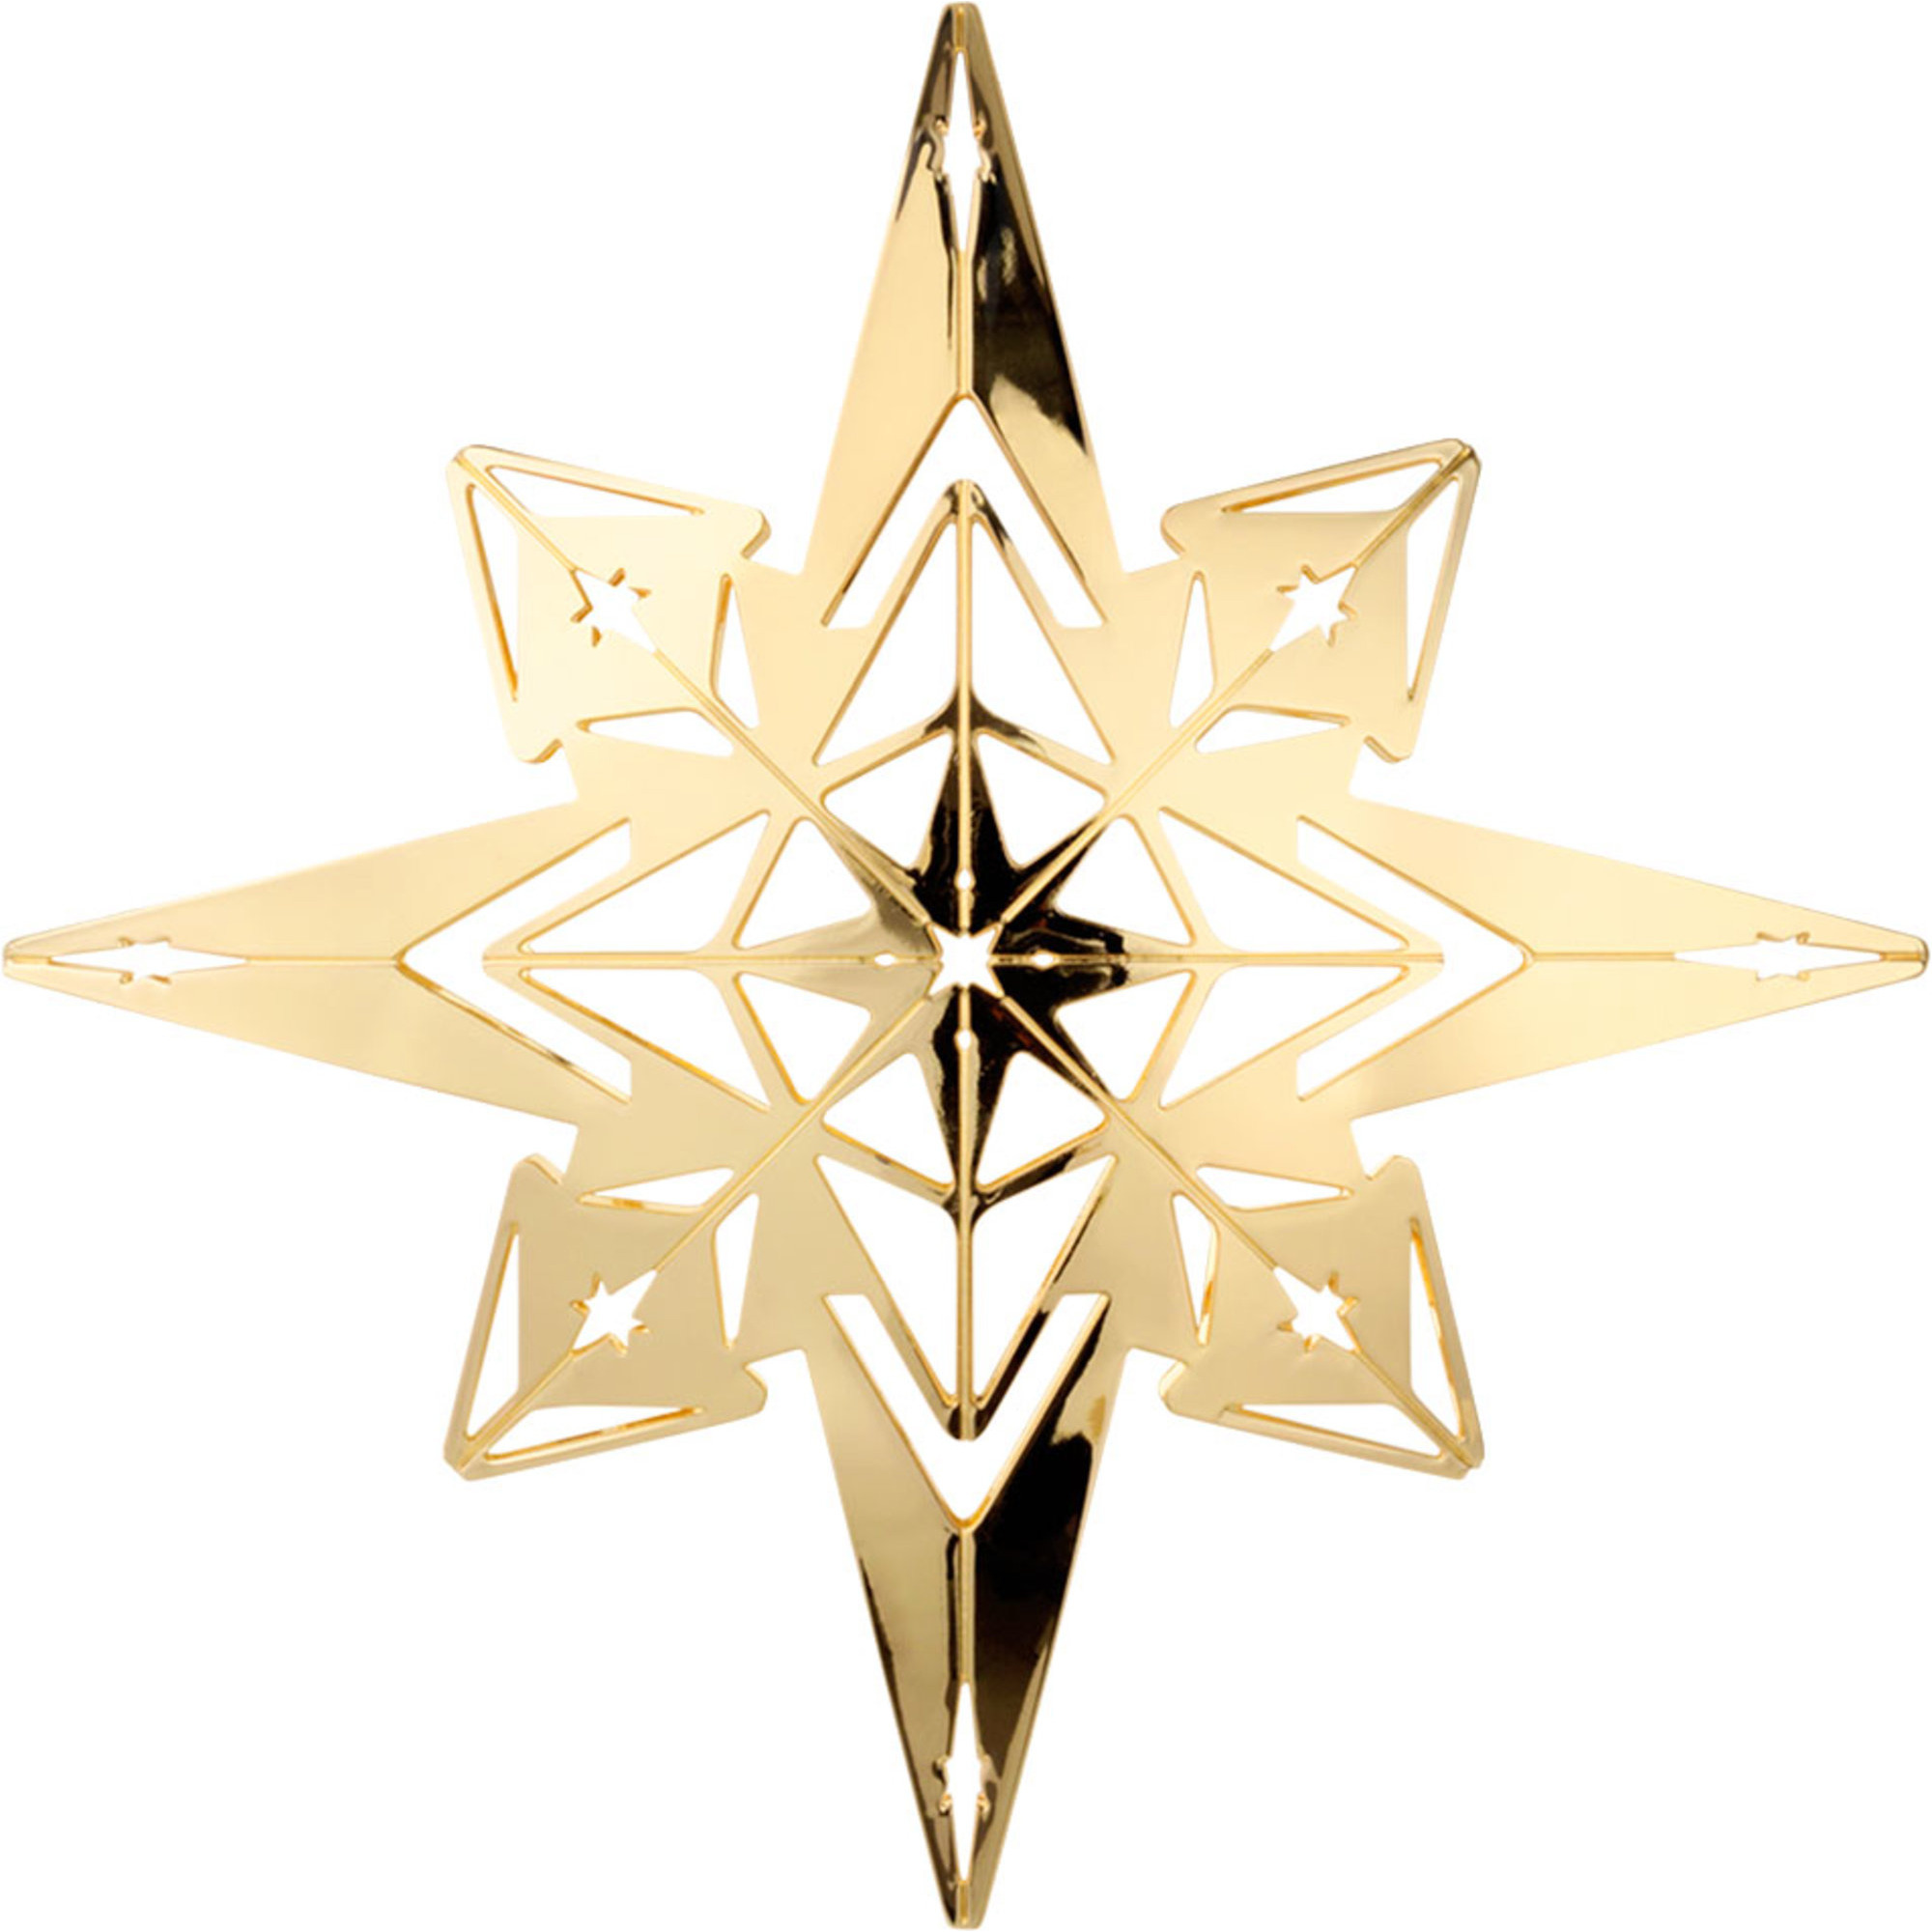 Rosendahl Stjärnhänge 95 cm Förgyllt